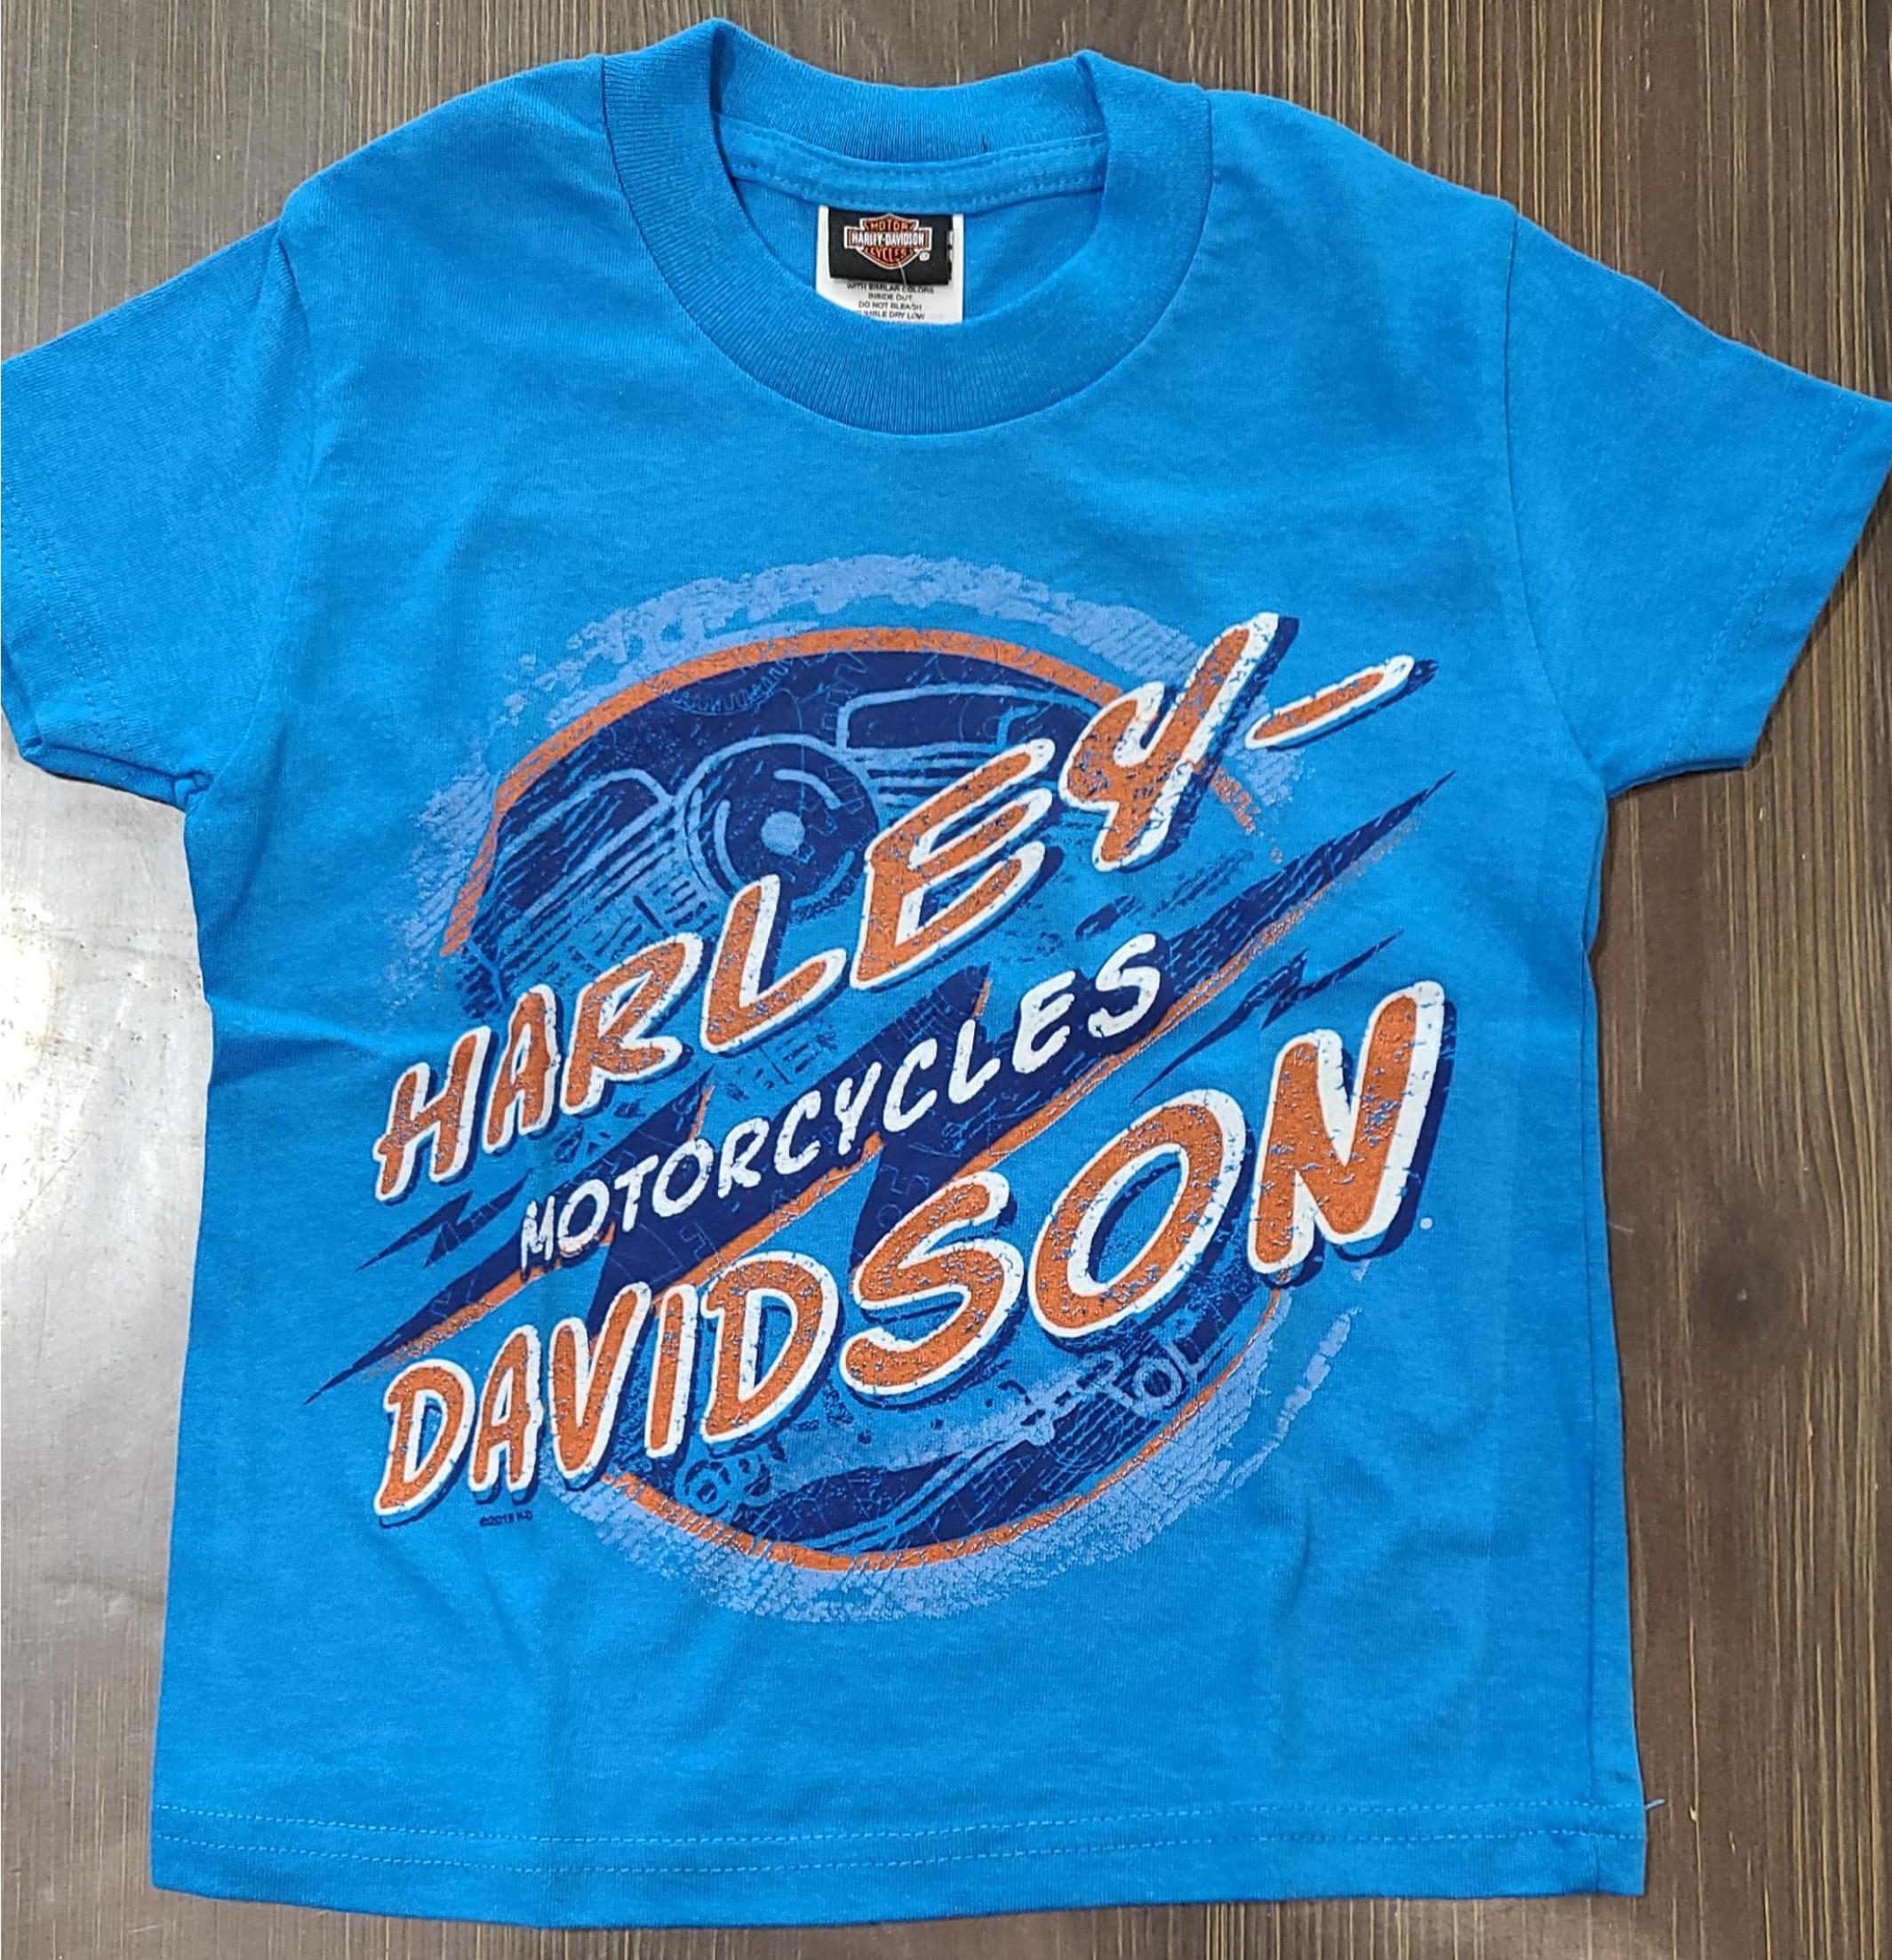 HARLEY DAVIDSON ELECTRIC BLUE*ROAD BUM SIZE 2T/8 ANS